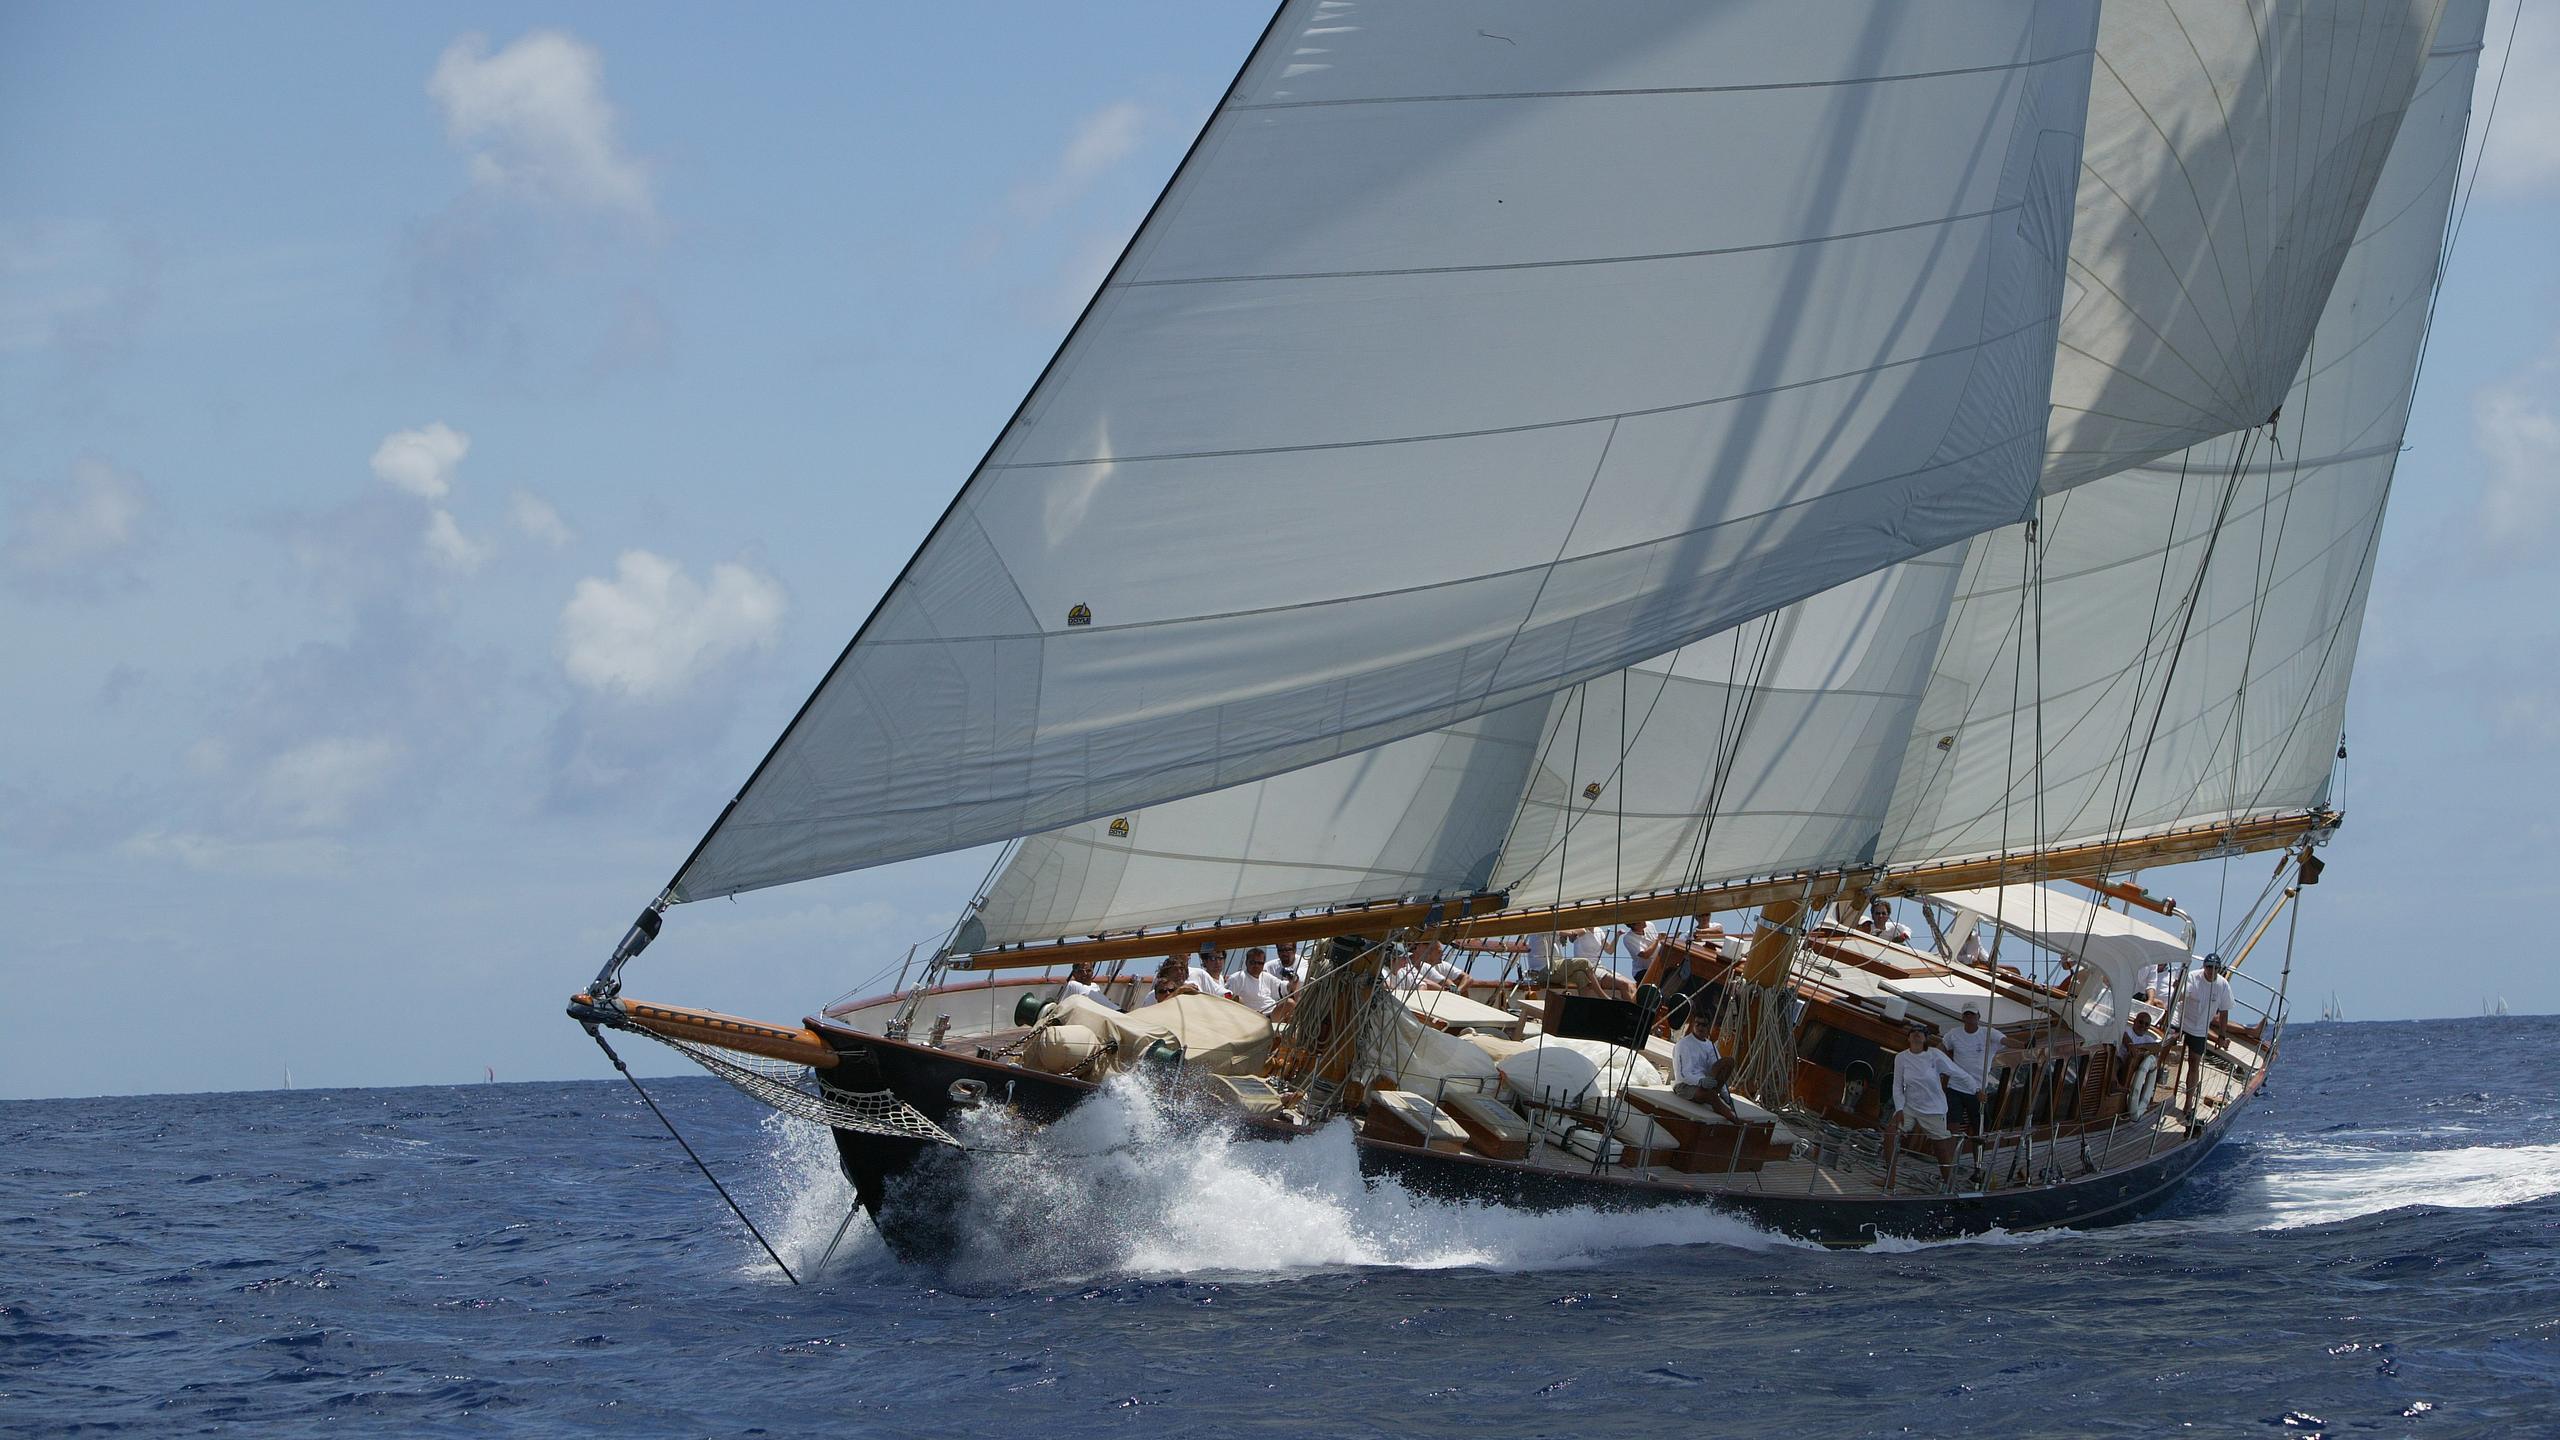 aschanti-iv-yacht-at-sea